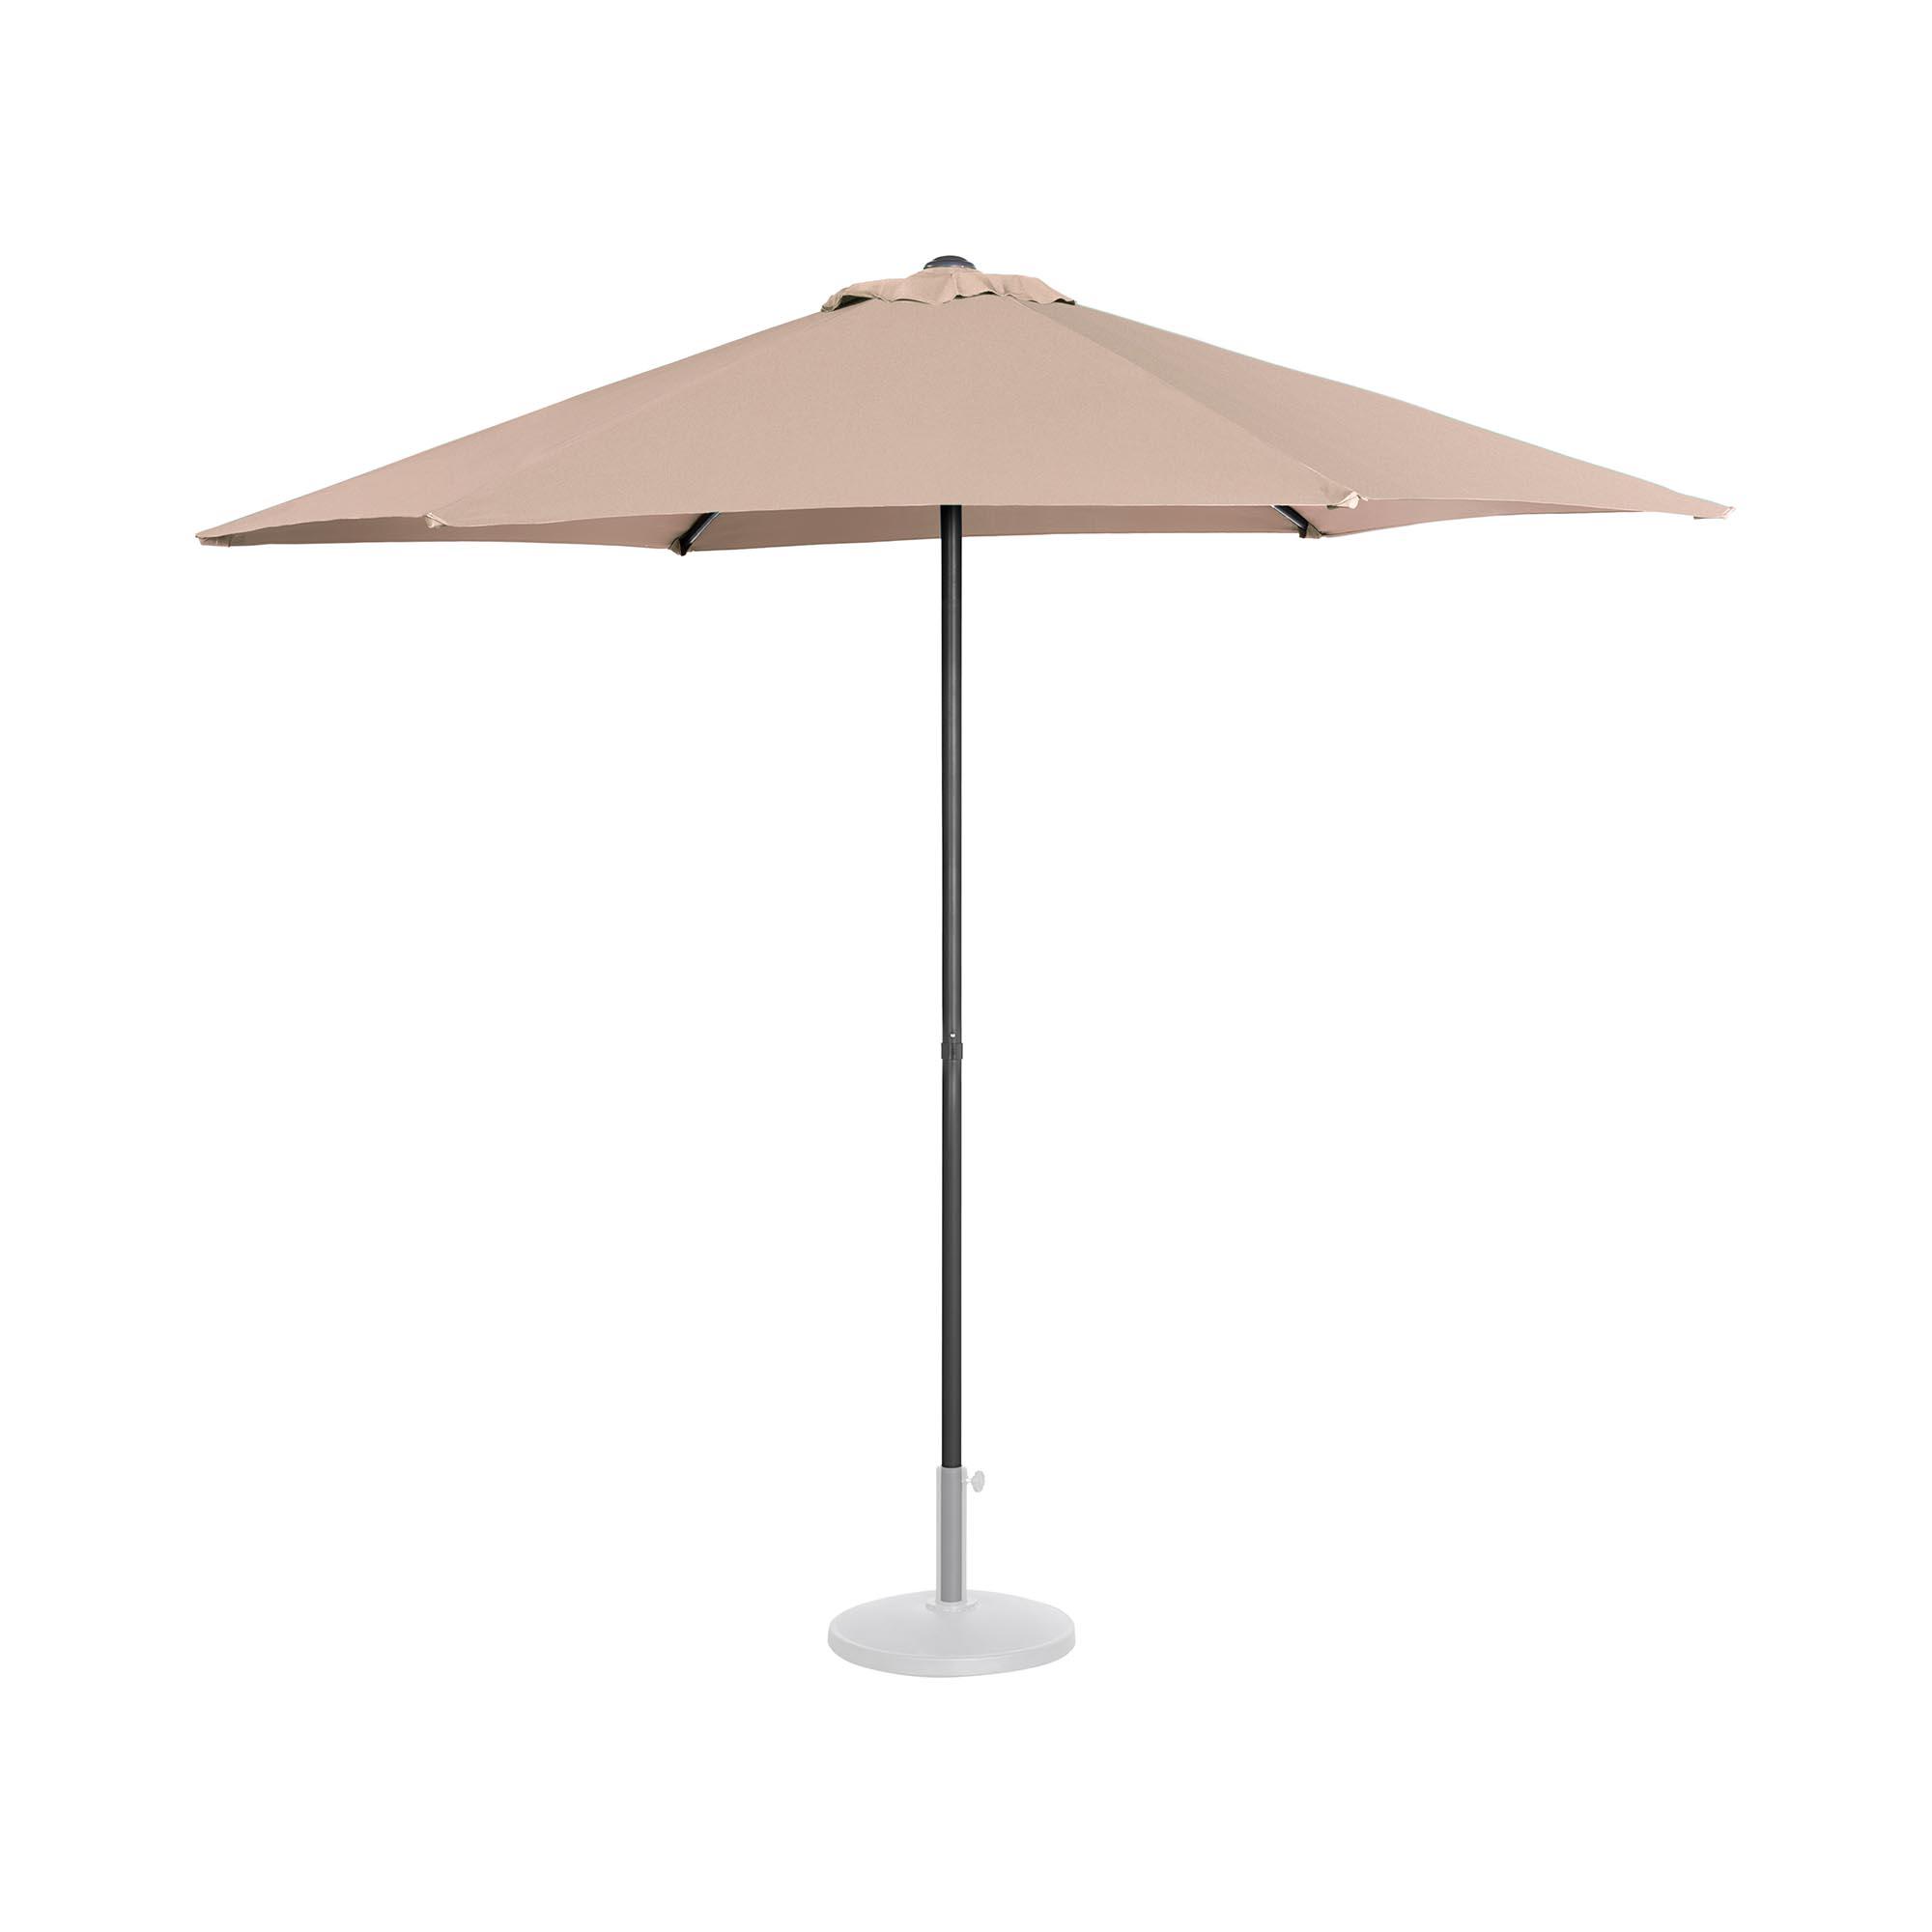 Uniprodo Sonnenschirm groß - creme - sechseckig - Ø 270 cm UNI_UMBRELLA_MR270CR